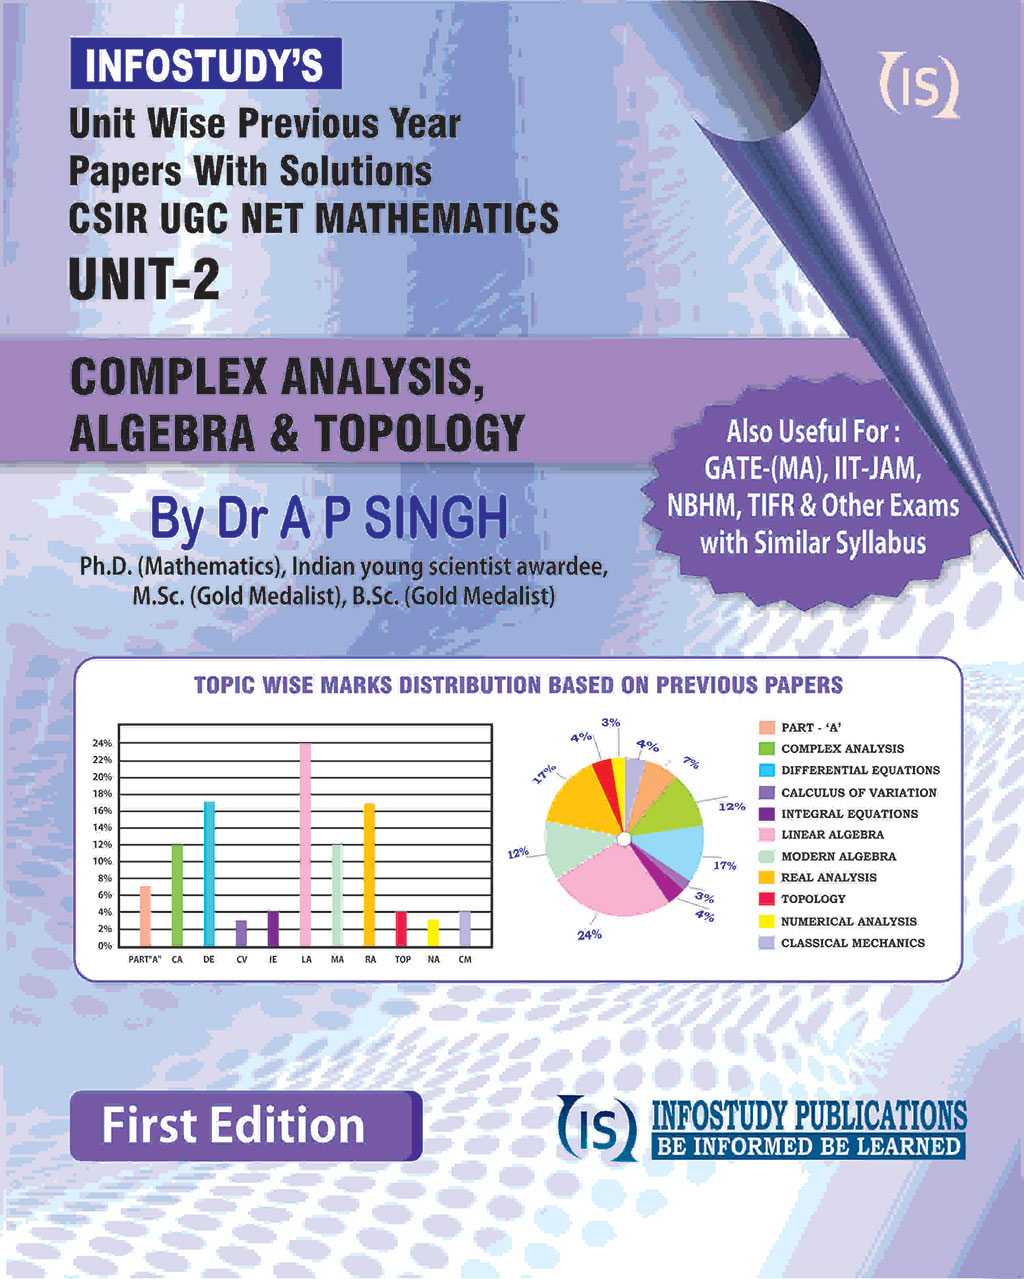 Infostudy Publications